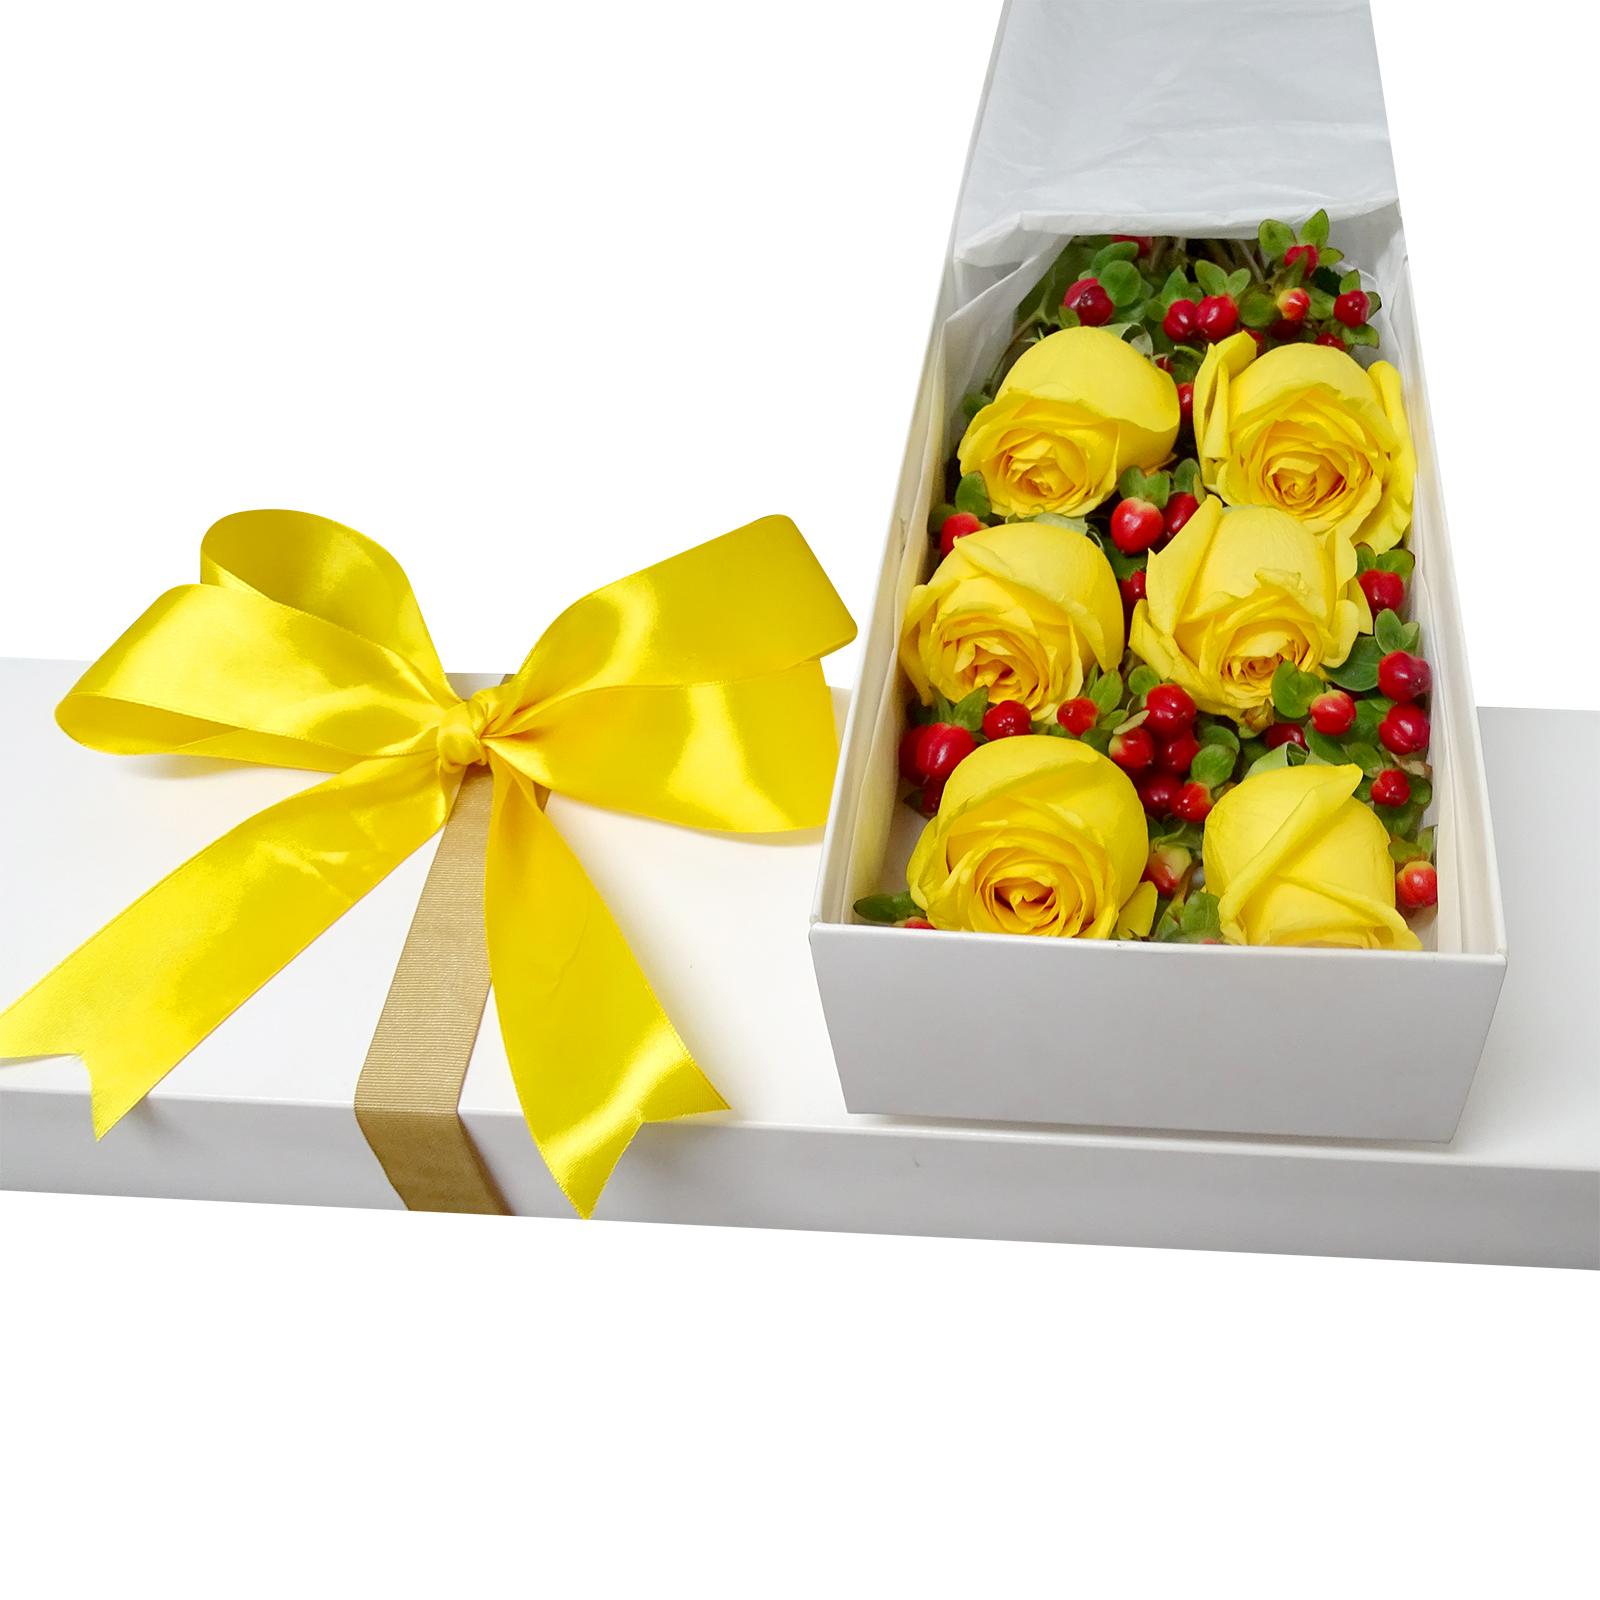 Caja con 6 Rosas de color Amarillo mas Hypericum